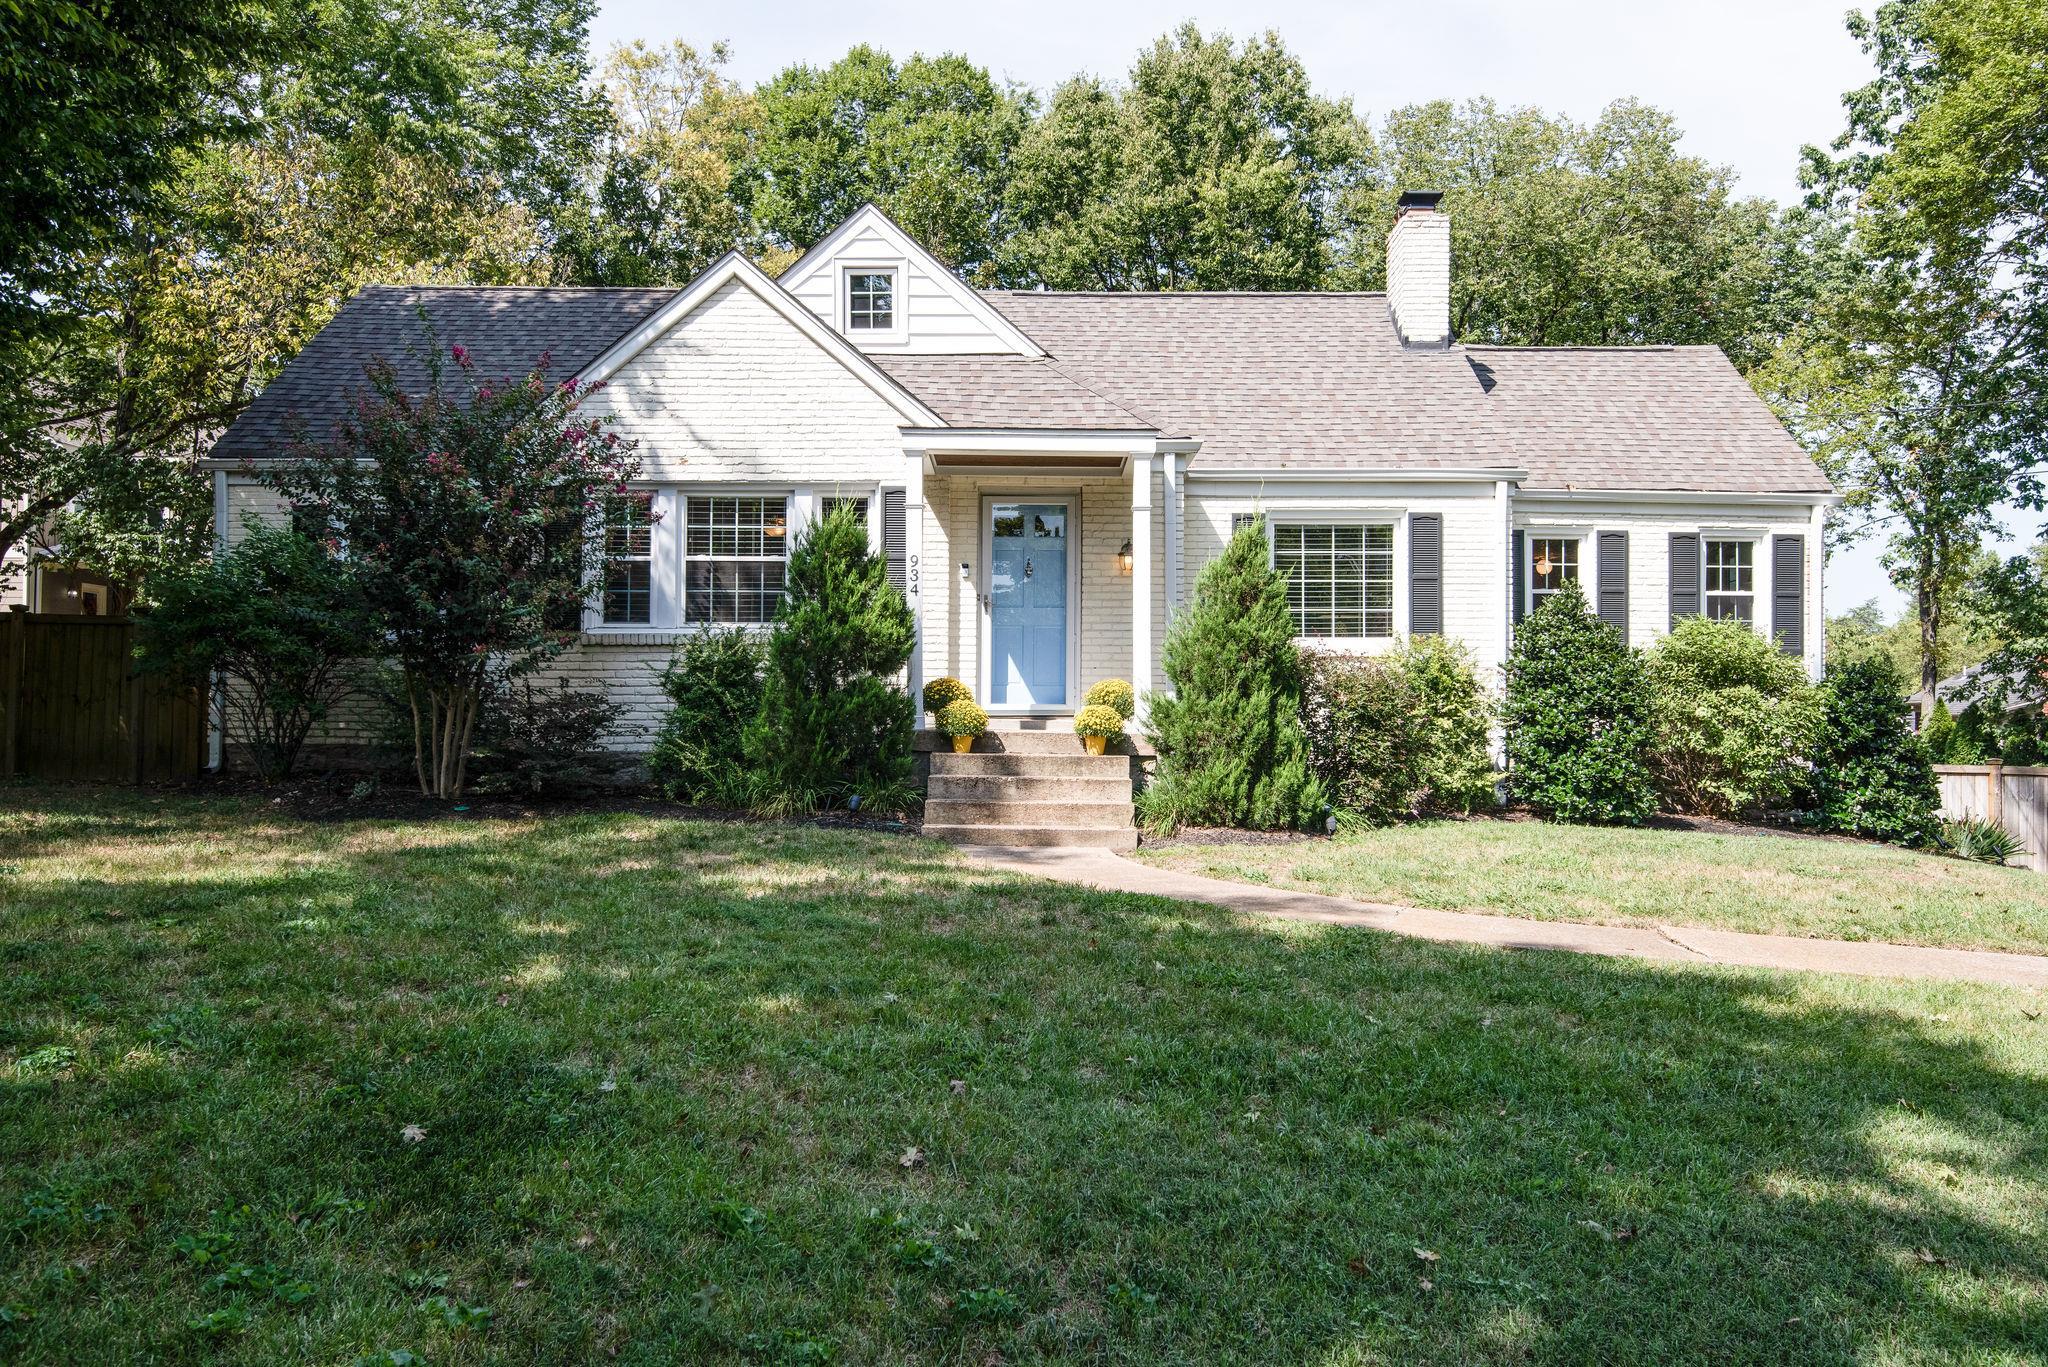 934 Battery Ln, Nashville, TN 37220 - Nashville, TN real estate listing